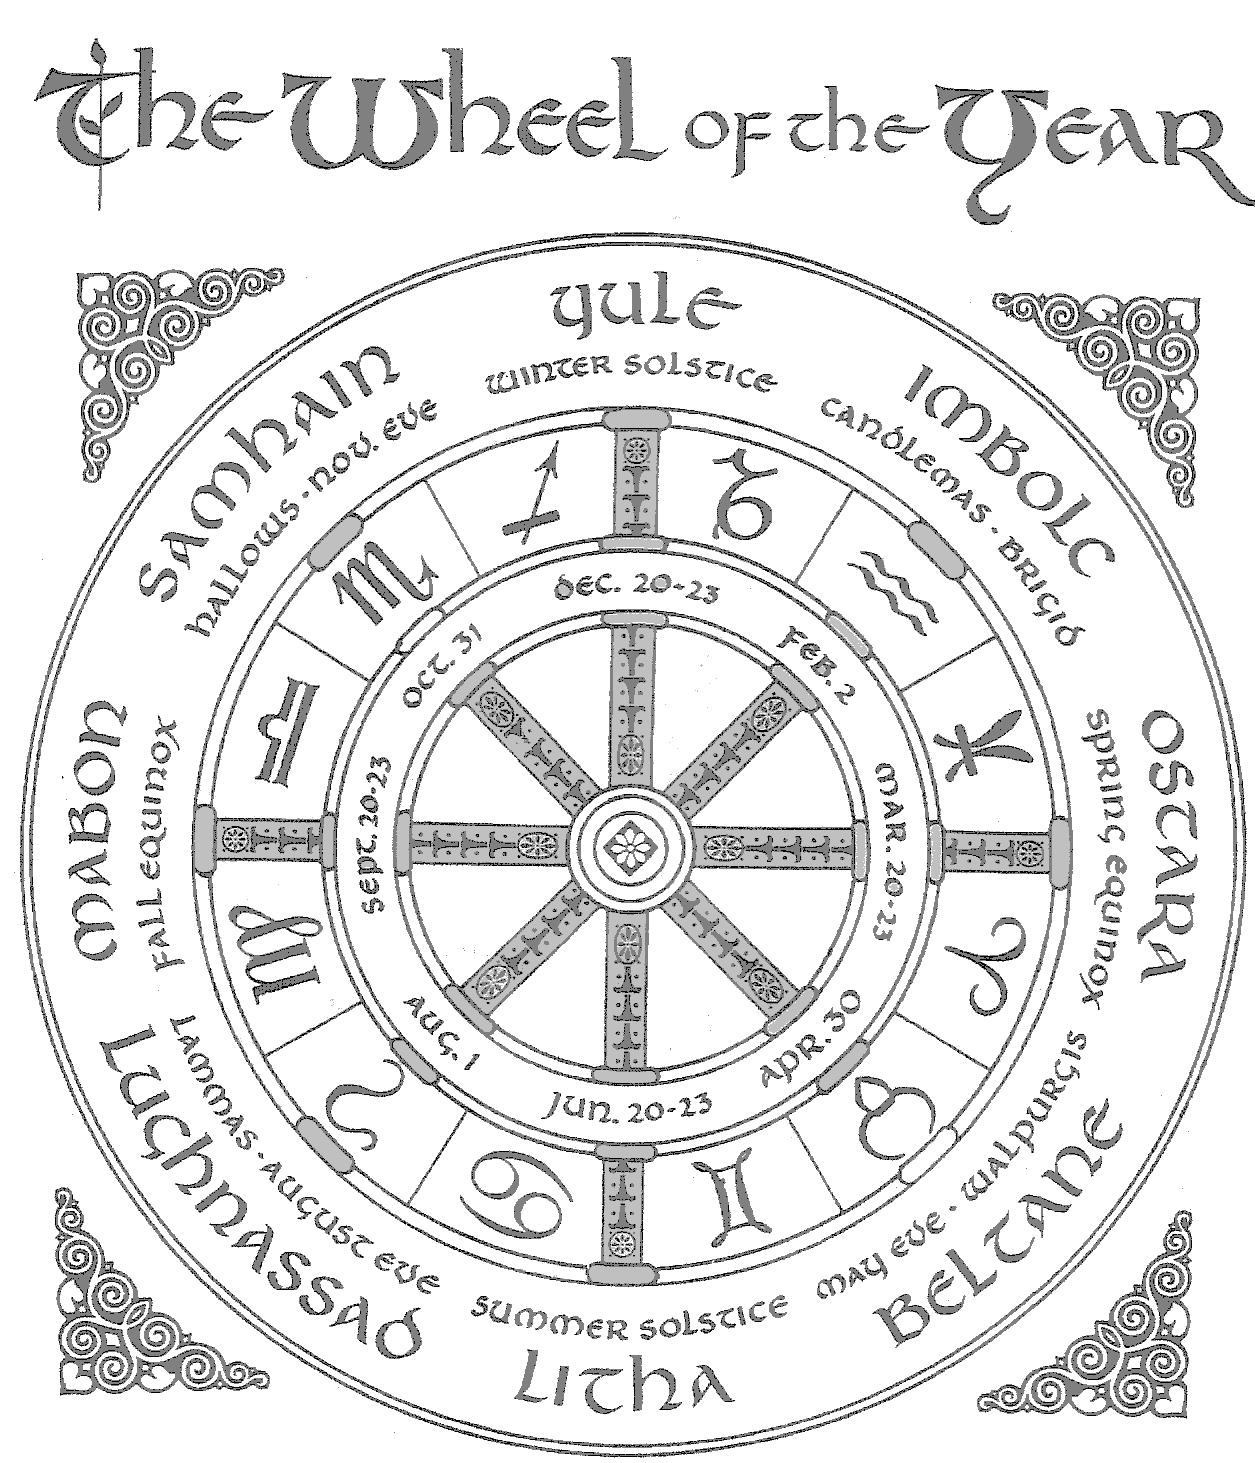 The Wheel Of The Year The Wheel Of The Year Is An